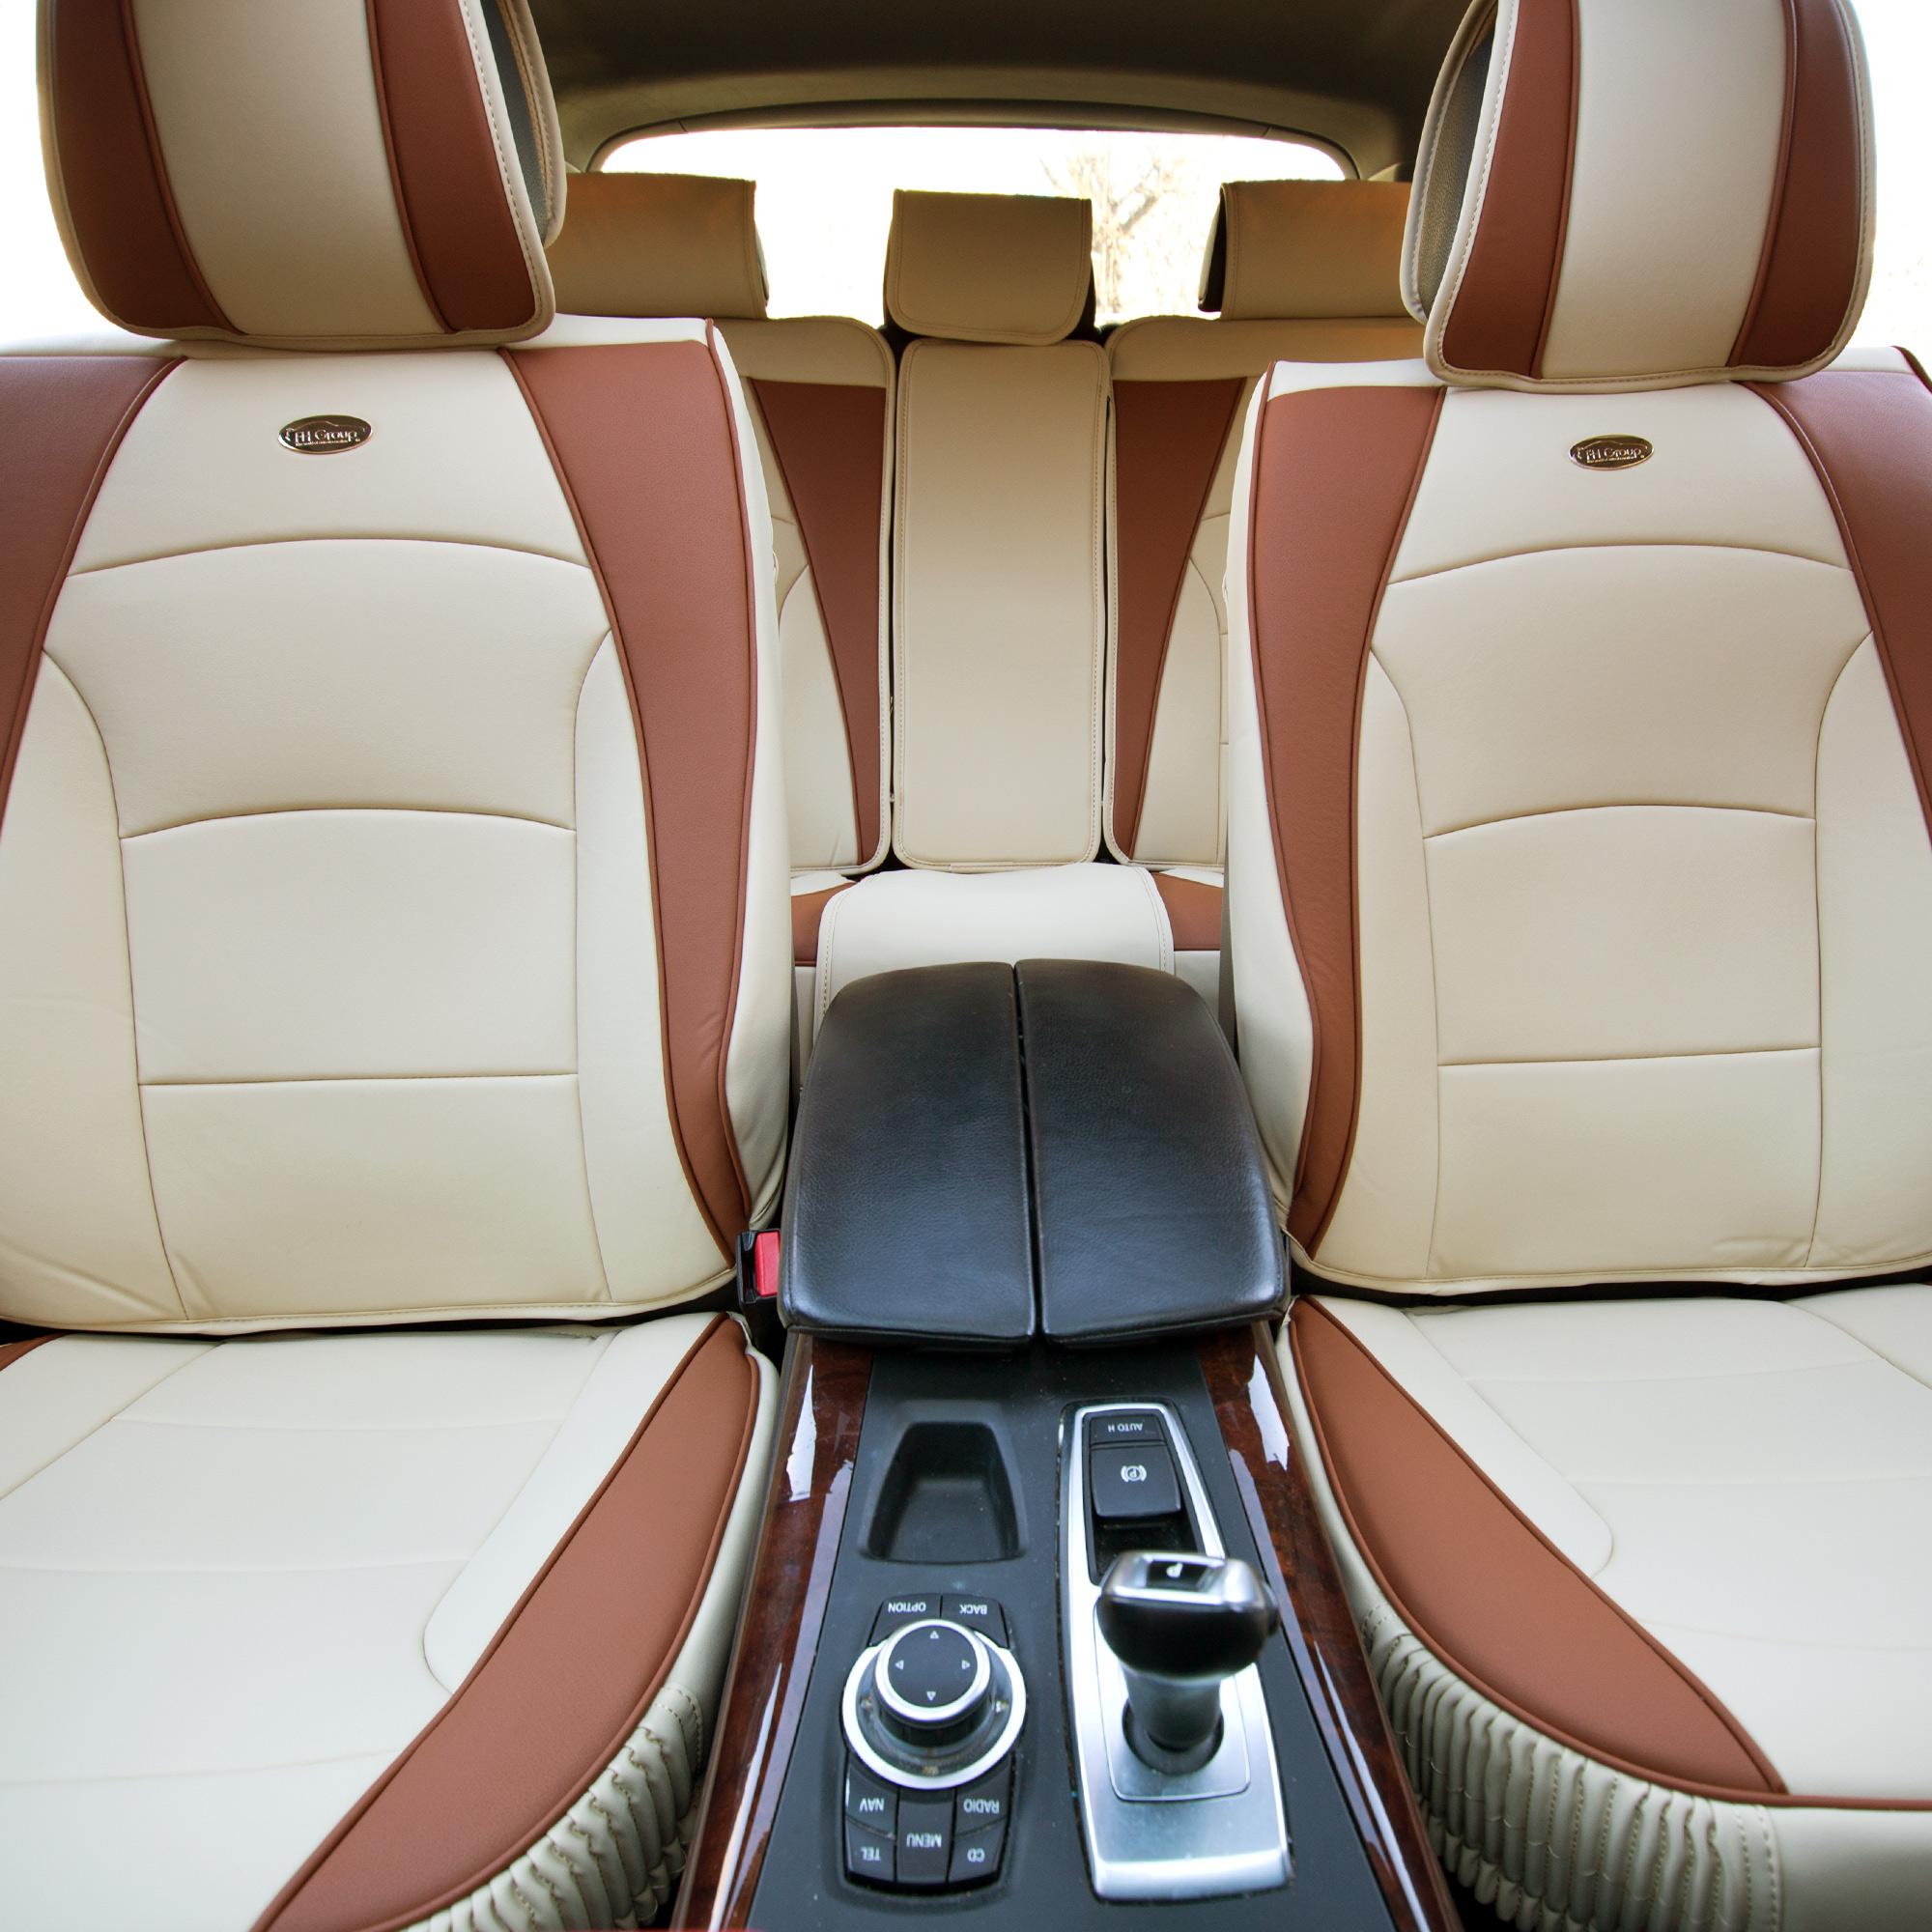 5 Seat Car SUV PU Leather Seat Cushion Covers Full Set 5